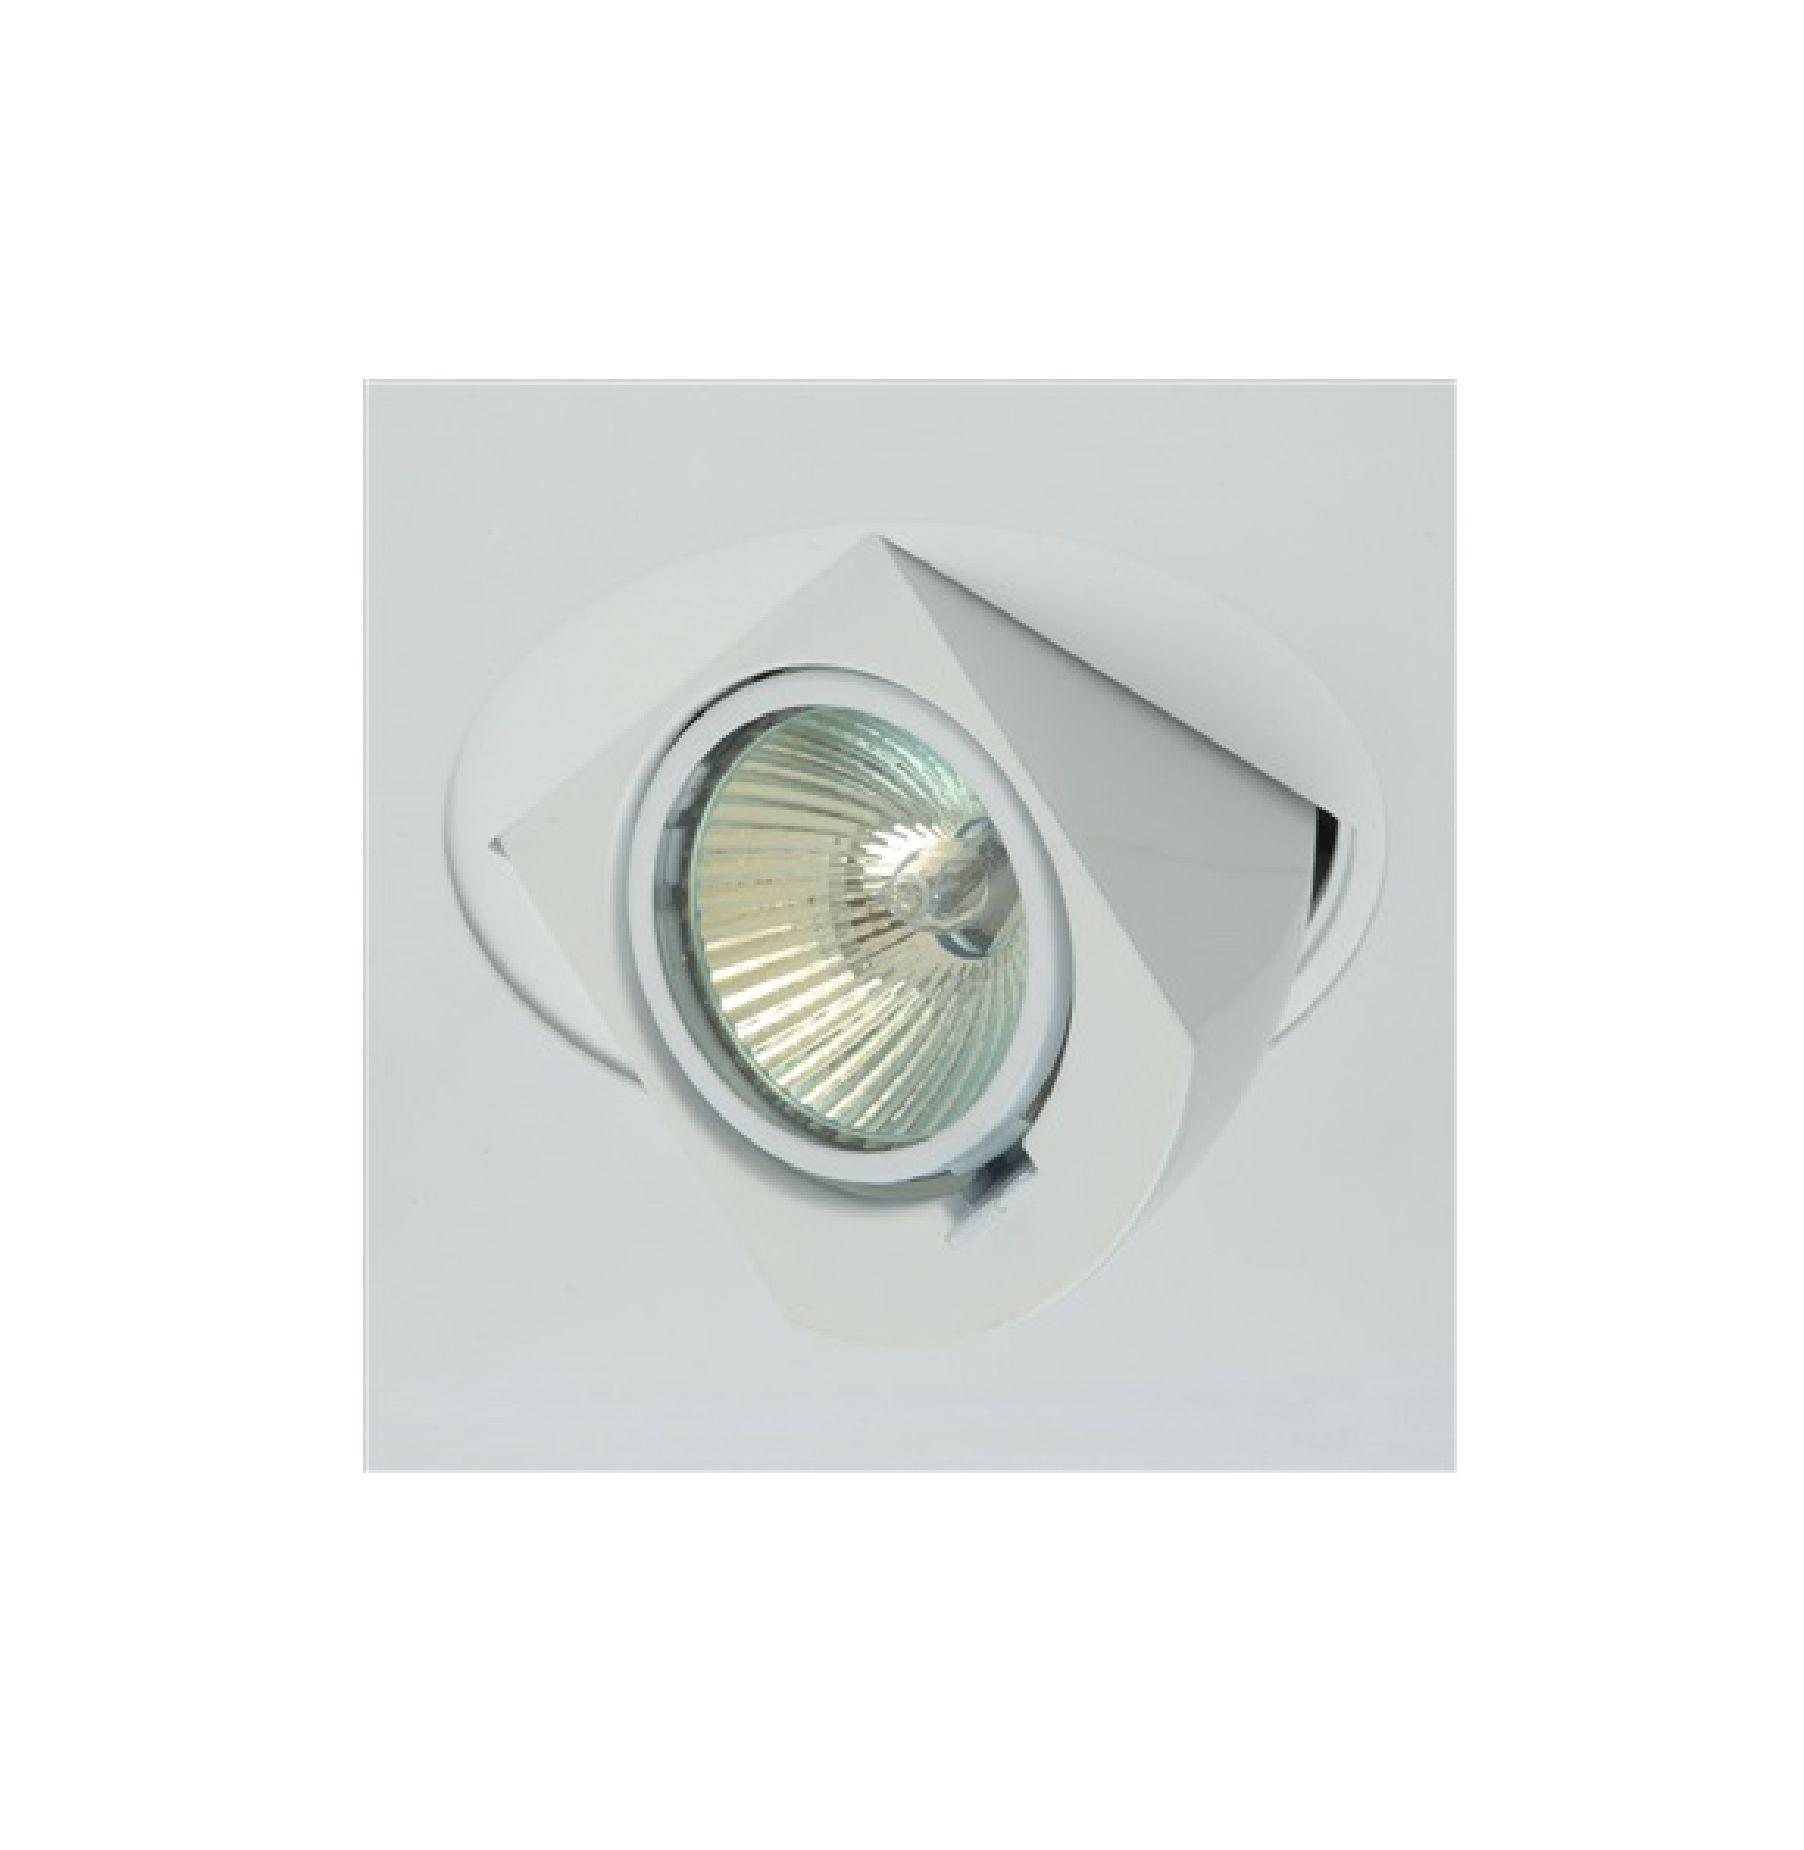 Alcon Lighting Oculare 14019-2 Adjustable Pull Down Multiple LED ...